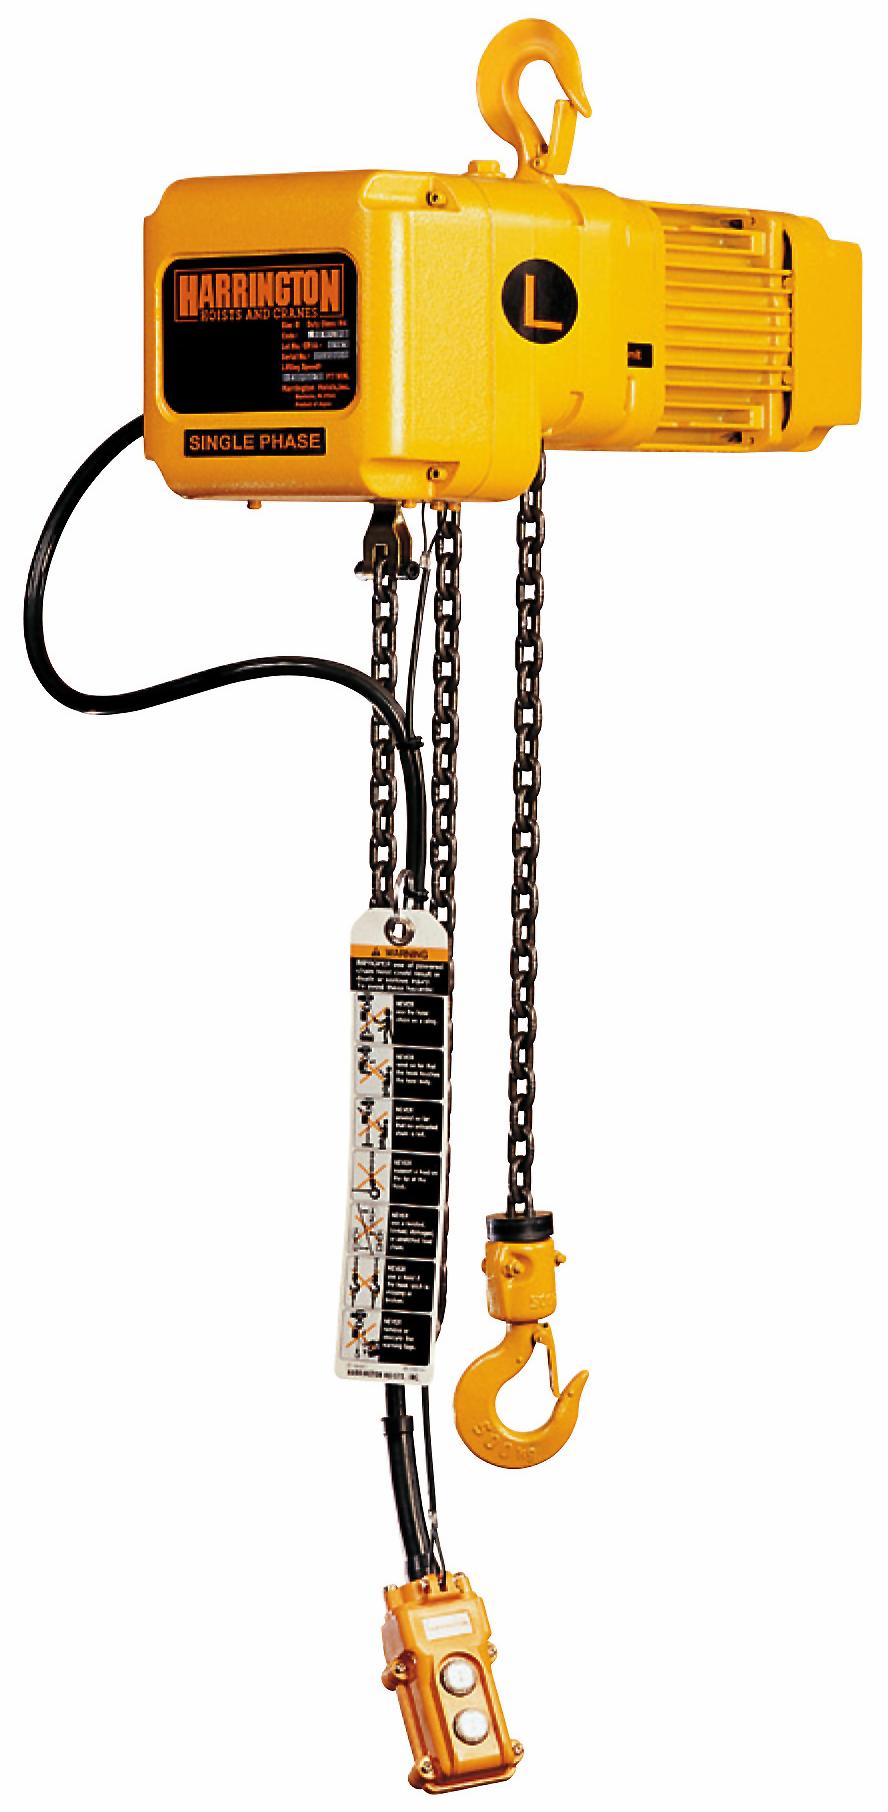 1/2-Ton Harrington SNER Electric Chain Hoist